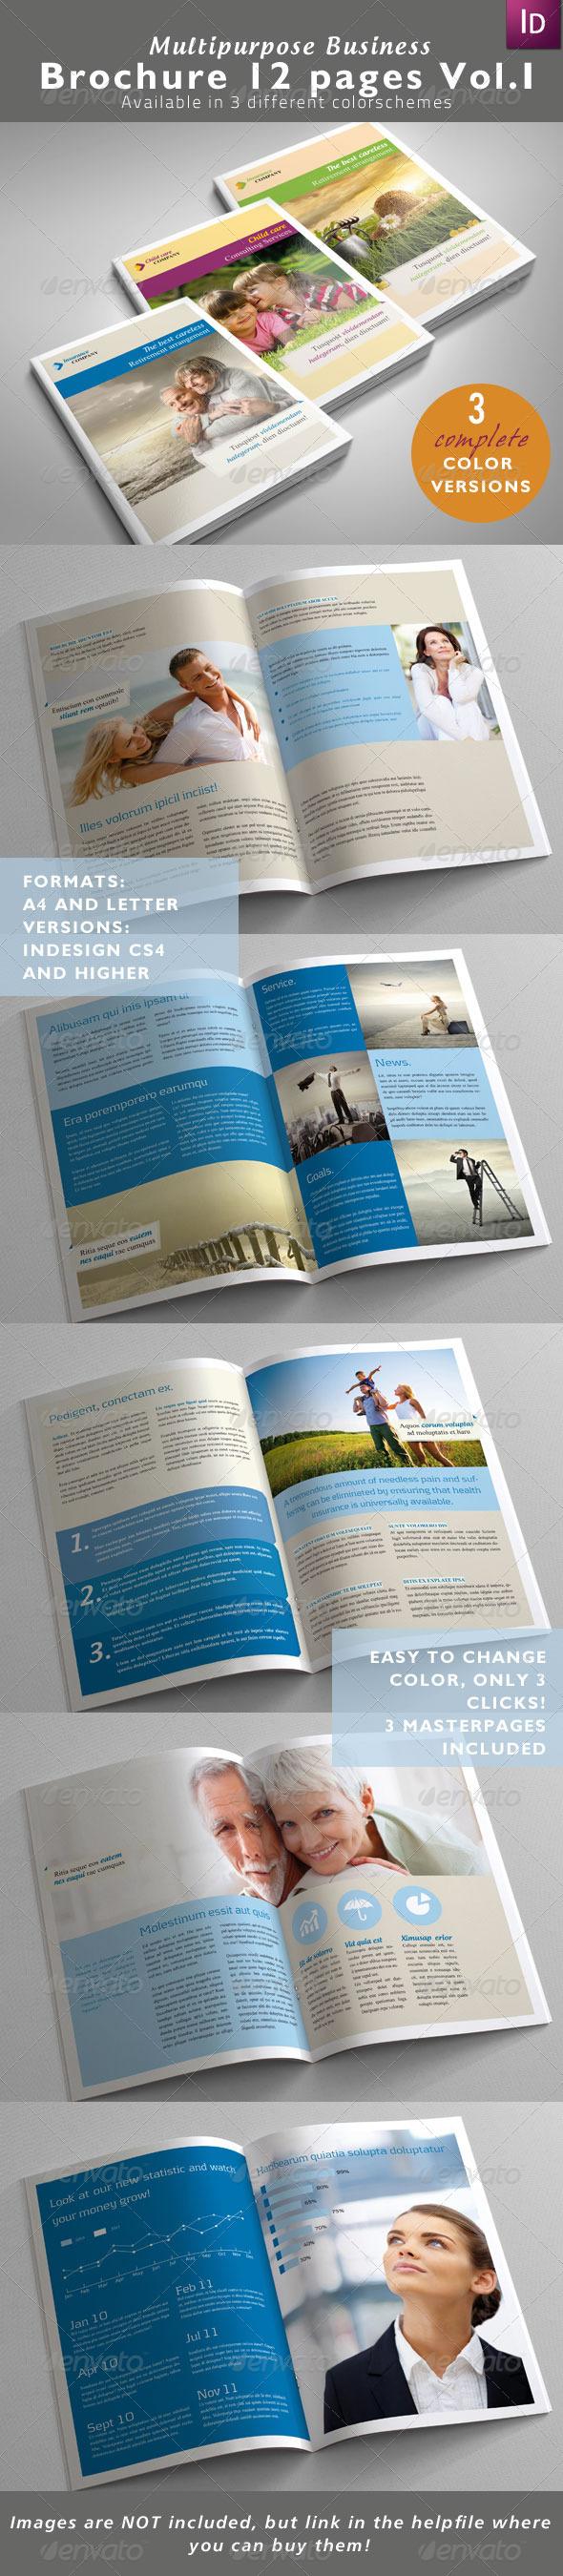 Multipurpose Business Brochure Vol. I - Corporate Brochures